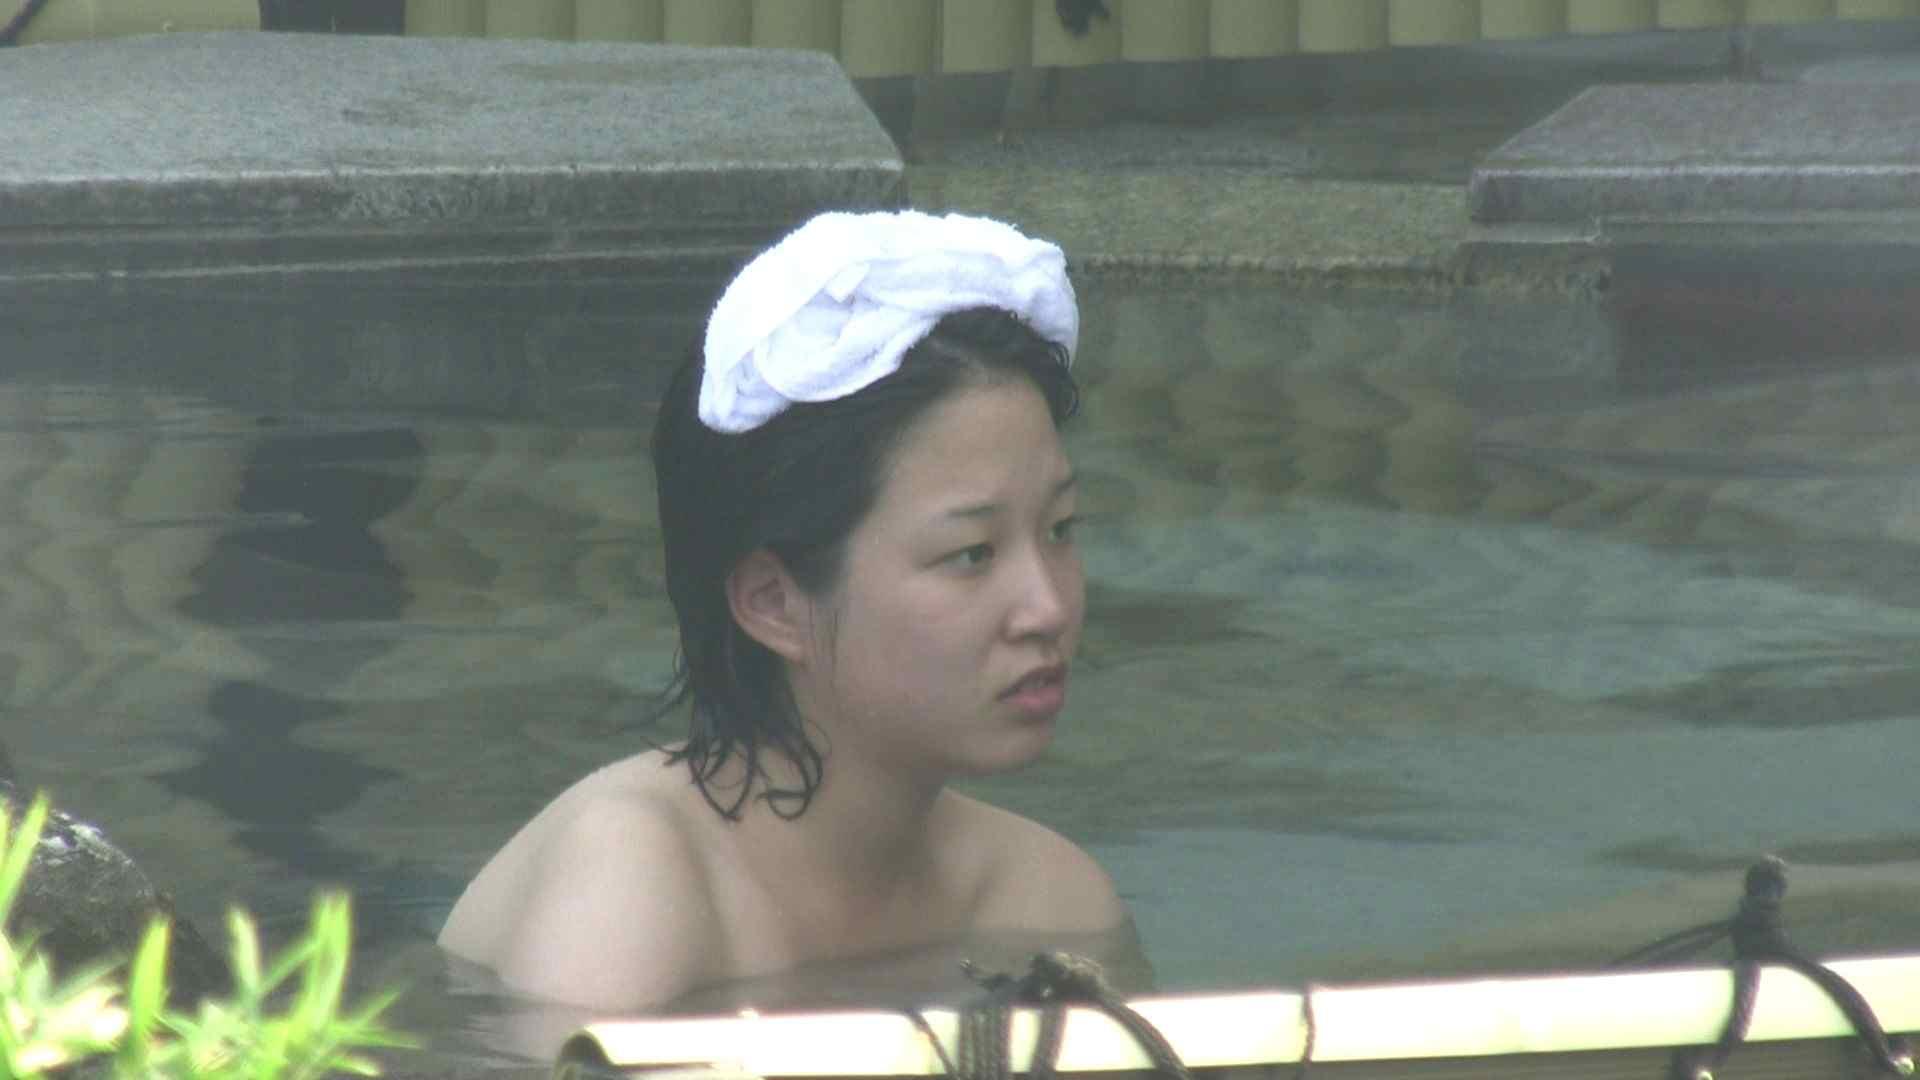 Aquaな露天風呂Vol.172 盗撮映像  113Pix 97